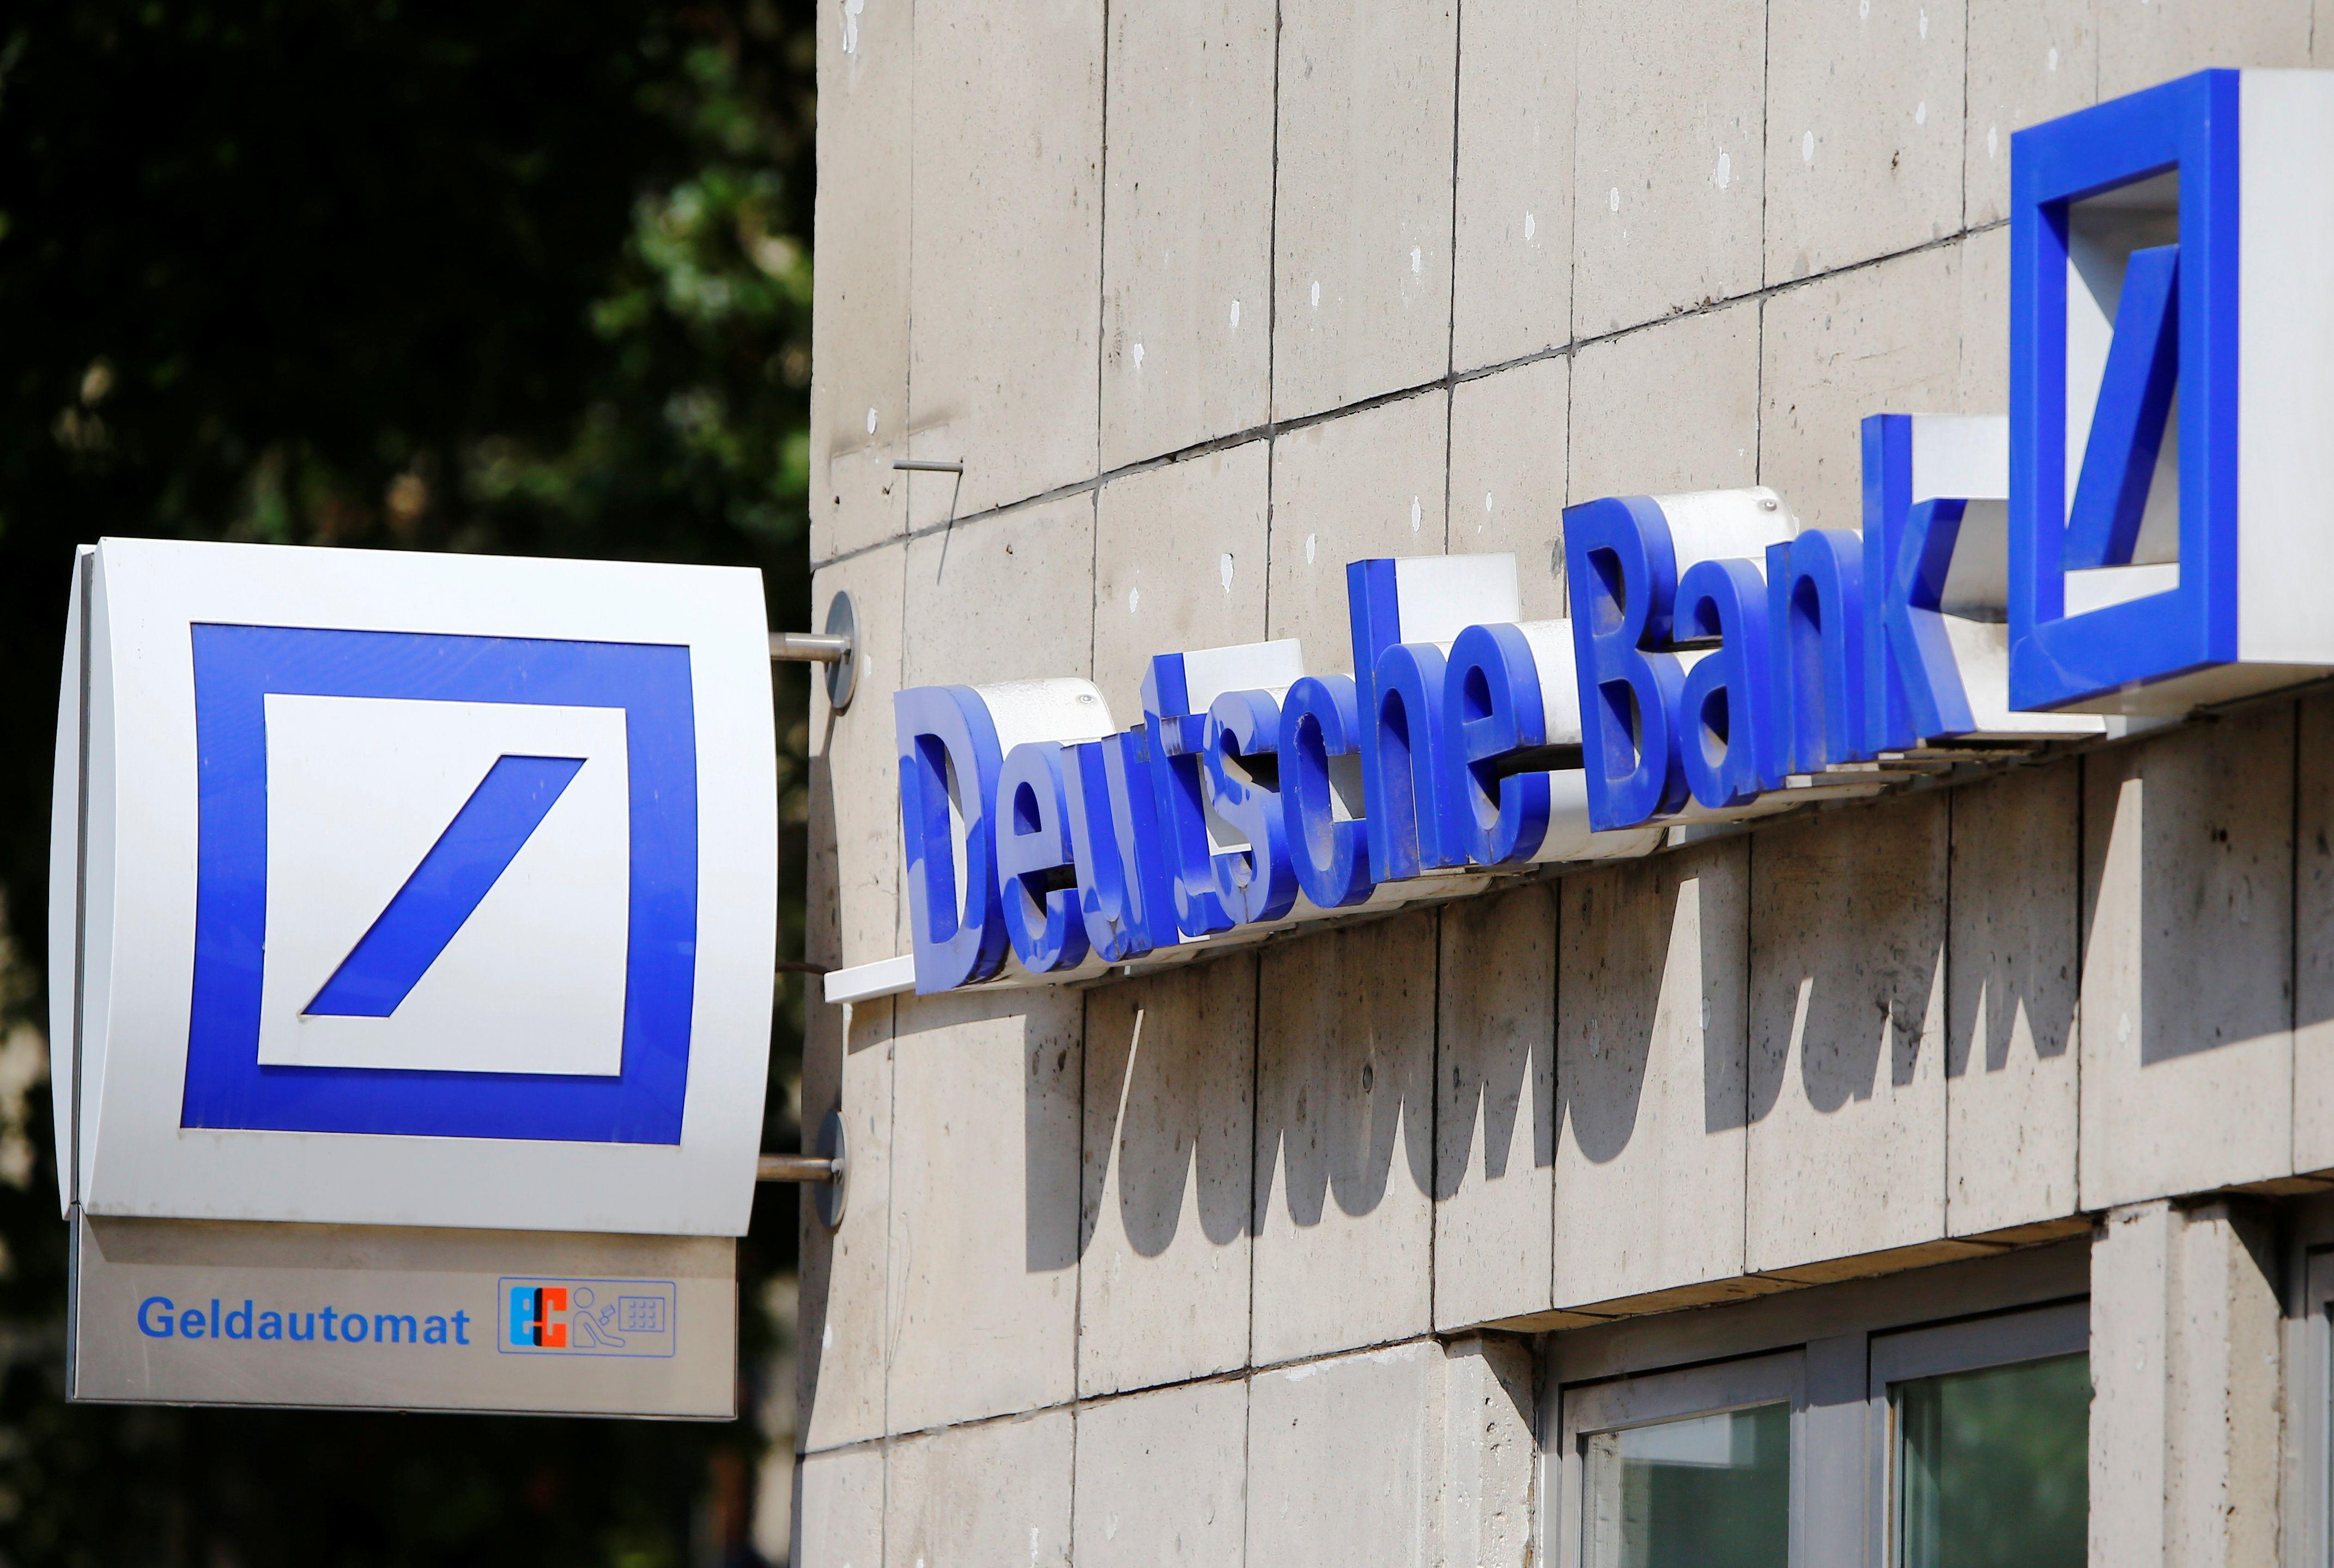 ��Deutsche Bank� aferas i�dav�s banko darbuotojas atsisak� milijonin�s premijos